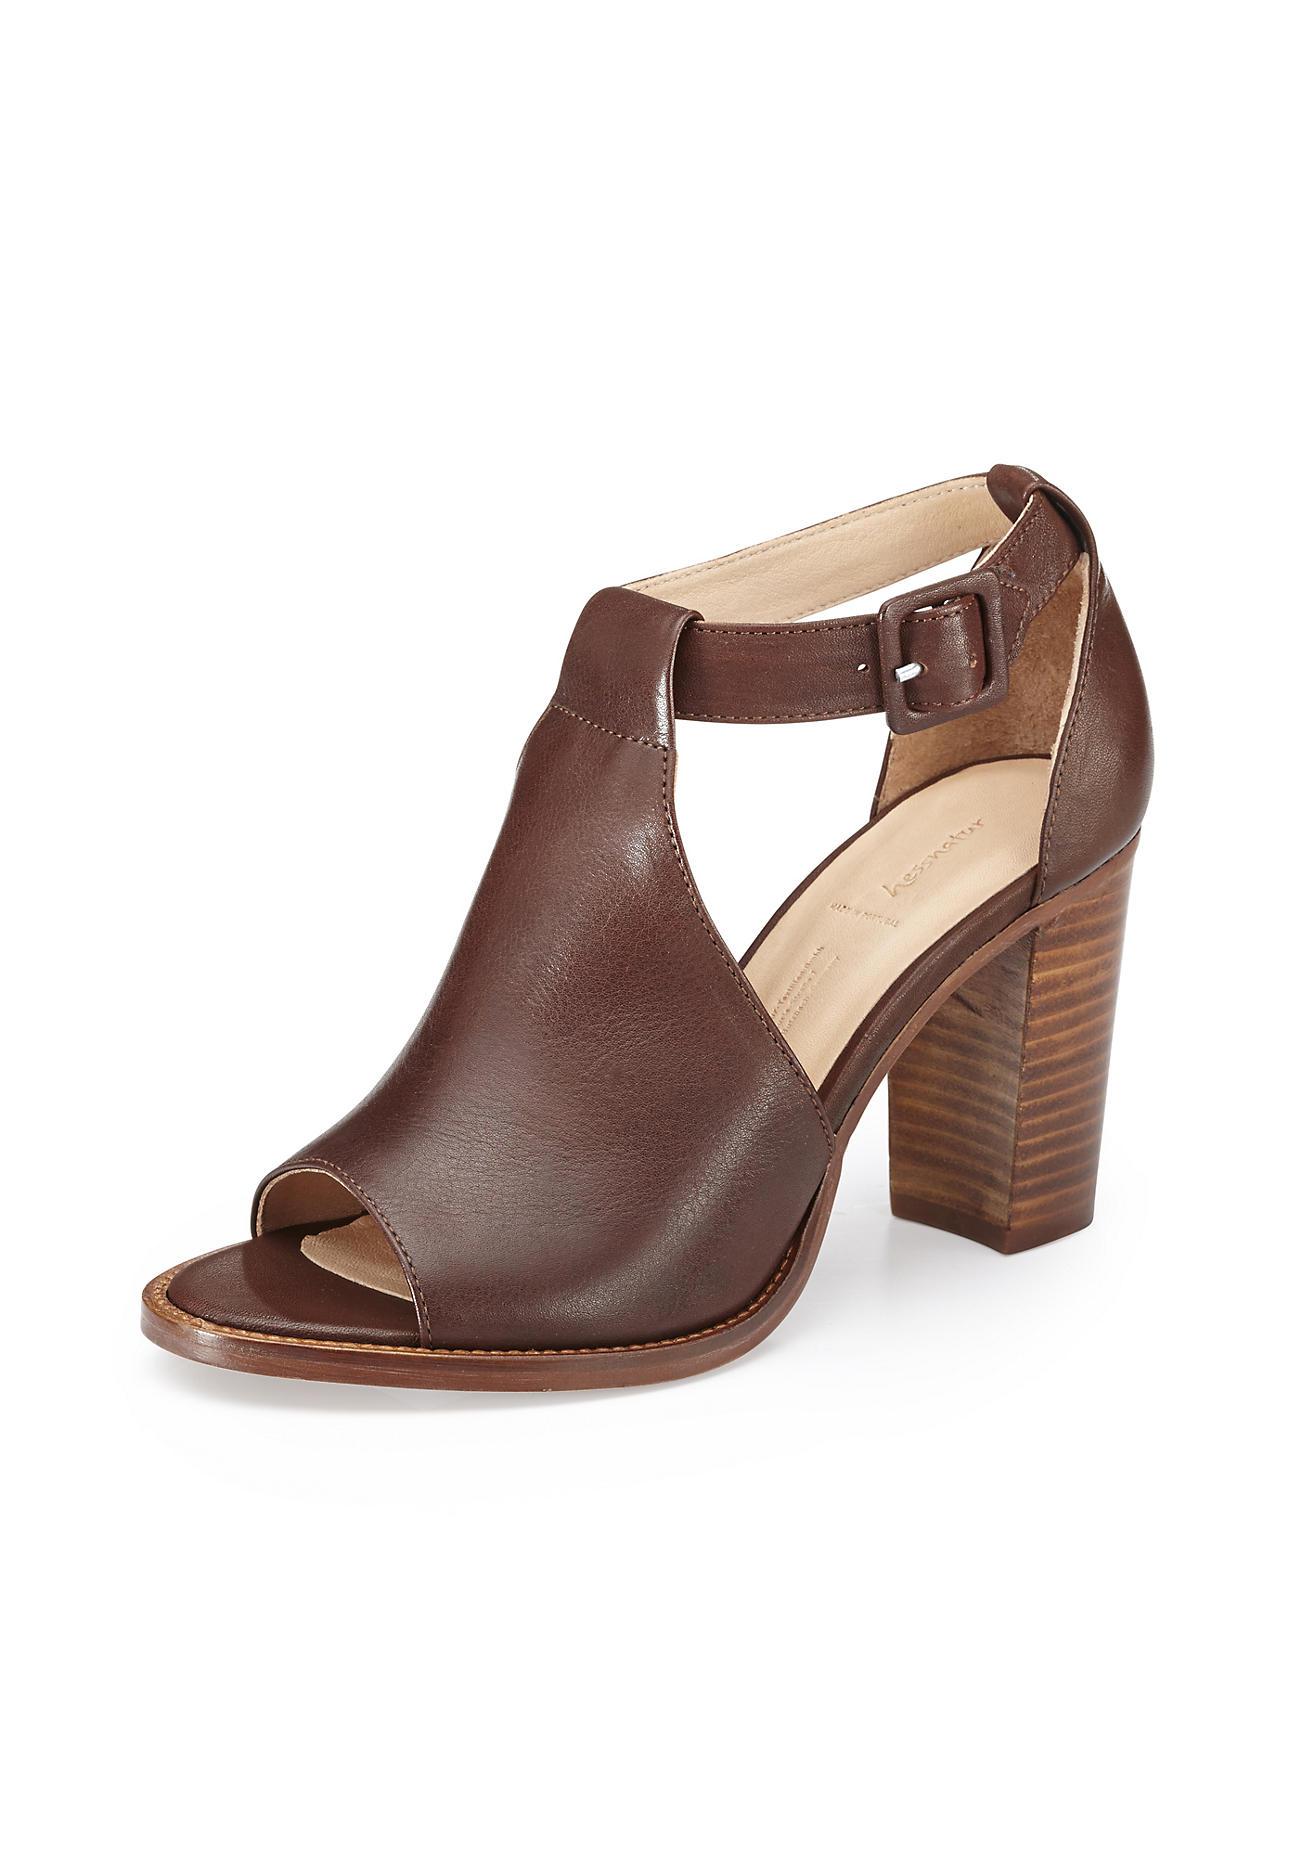 hessnatur Damen Damen Sandalette aus Leder – orange – Größe 39